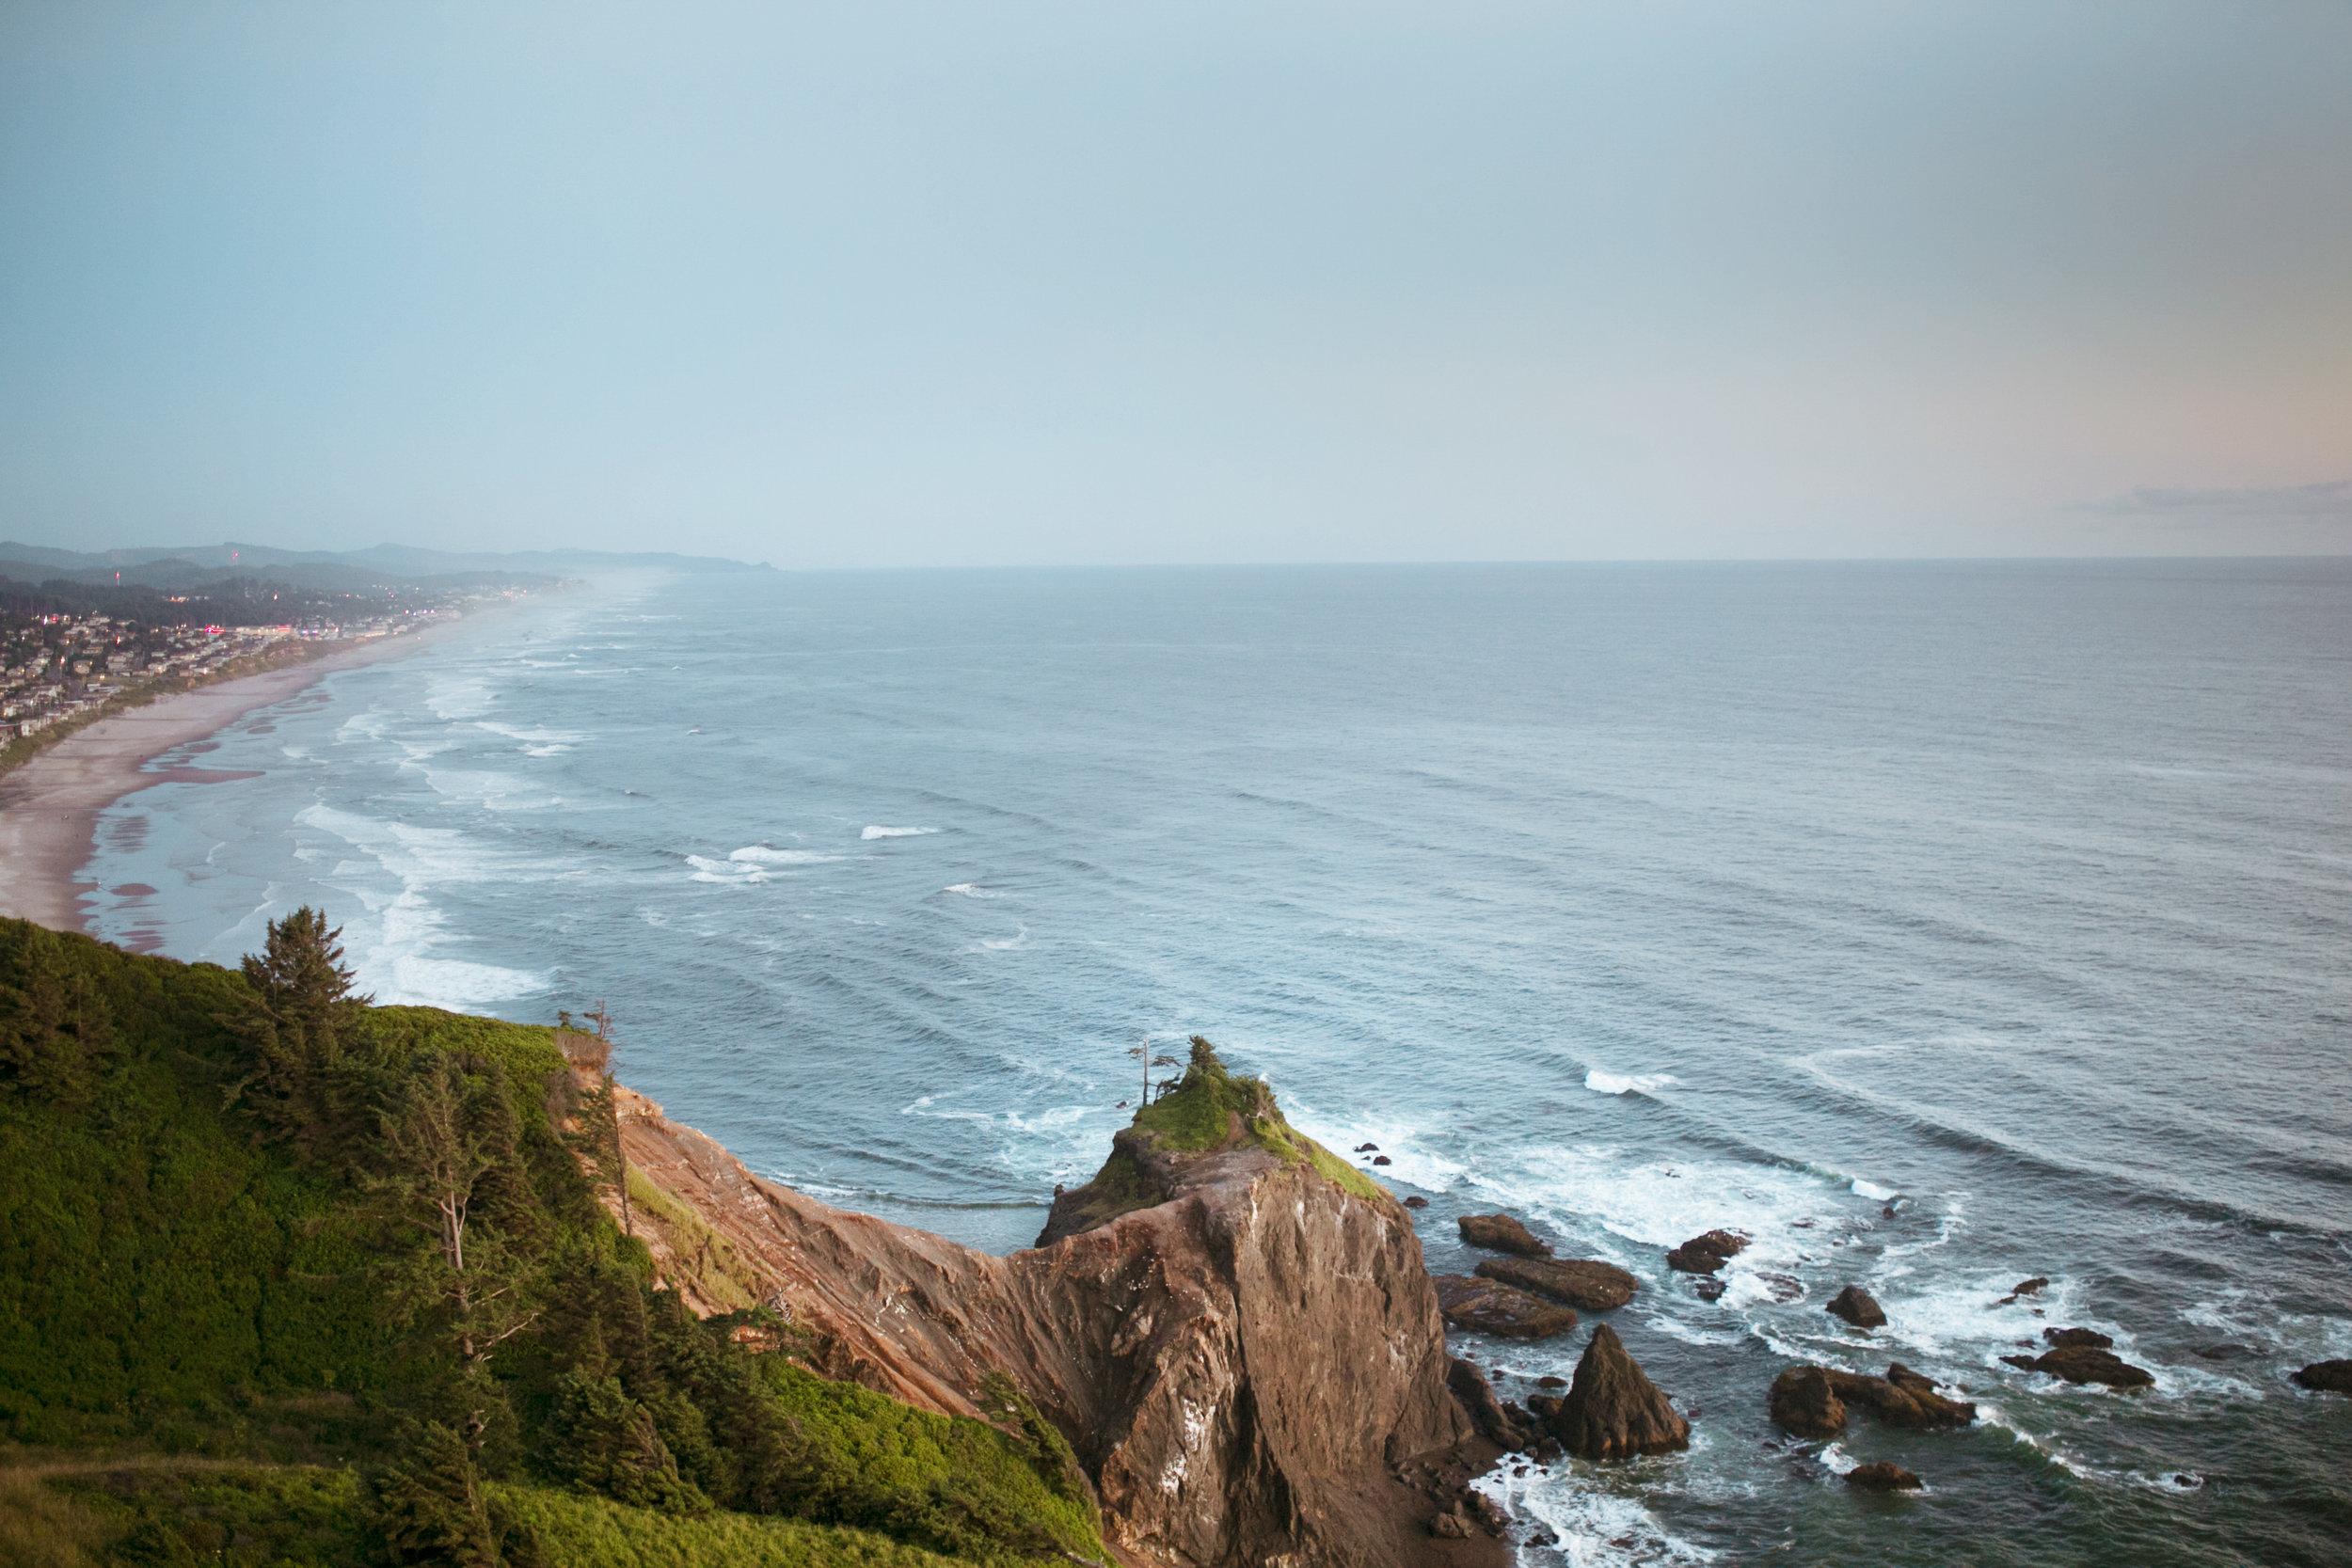 073Travel_Adventure_Outdoor_Photography_Outlive_Creative_Oregon_Coast_Gods_Thumb.jpg